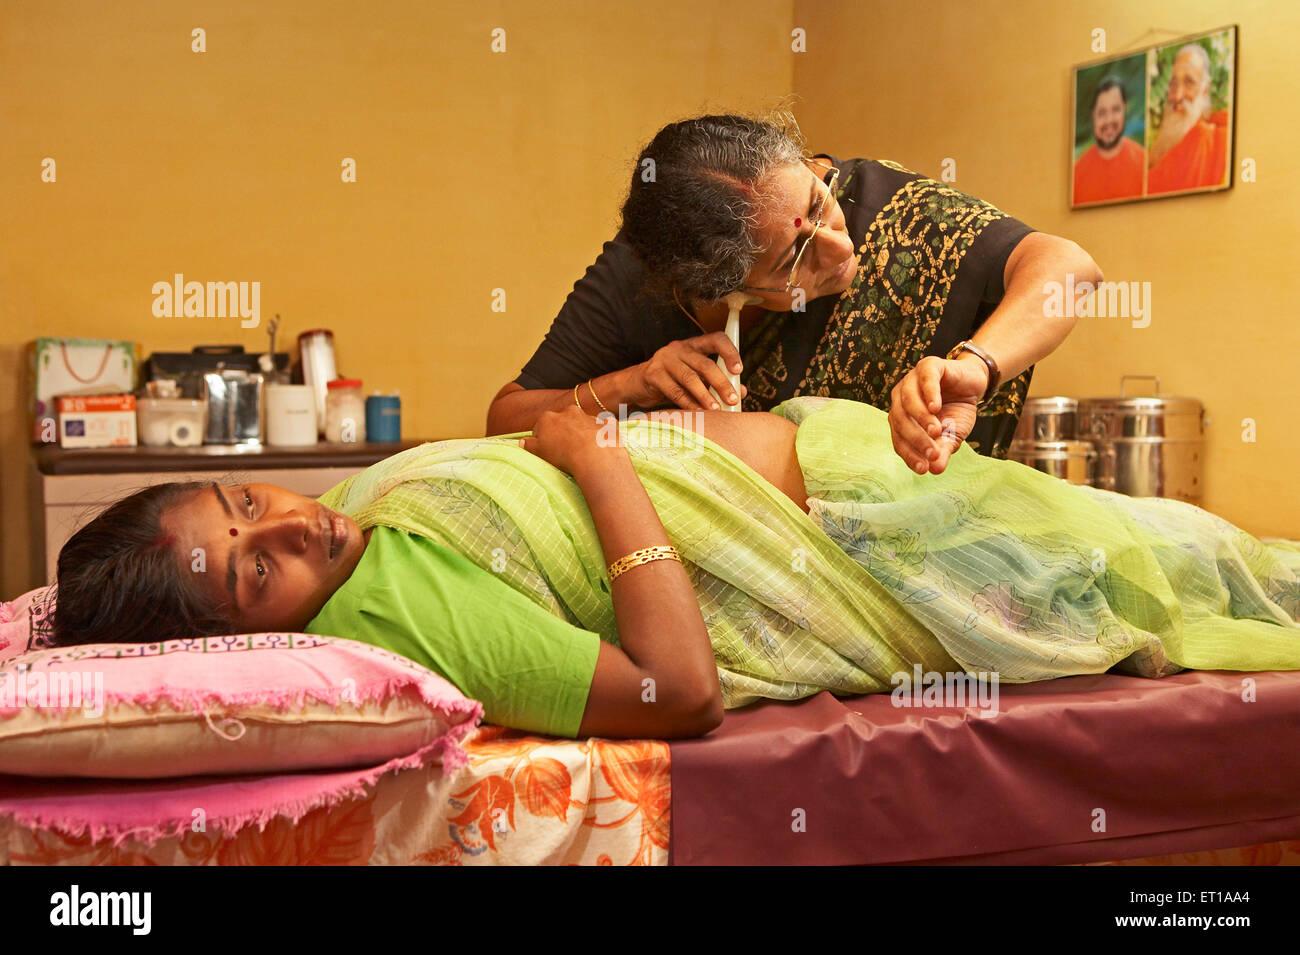 Health worker of NGO Chinmaya Organization of Rural Development CORD using fetal stethoscope on abdomen of pregnant - Stock Image